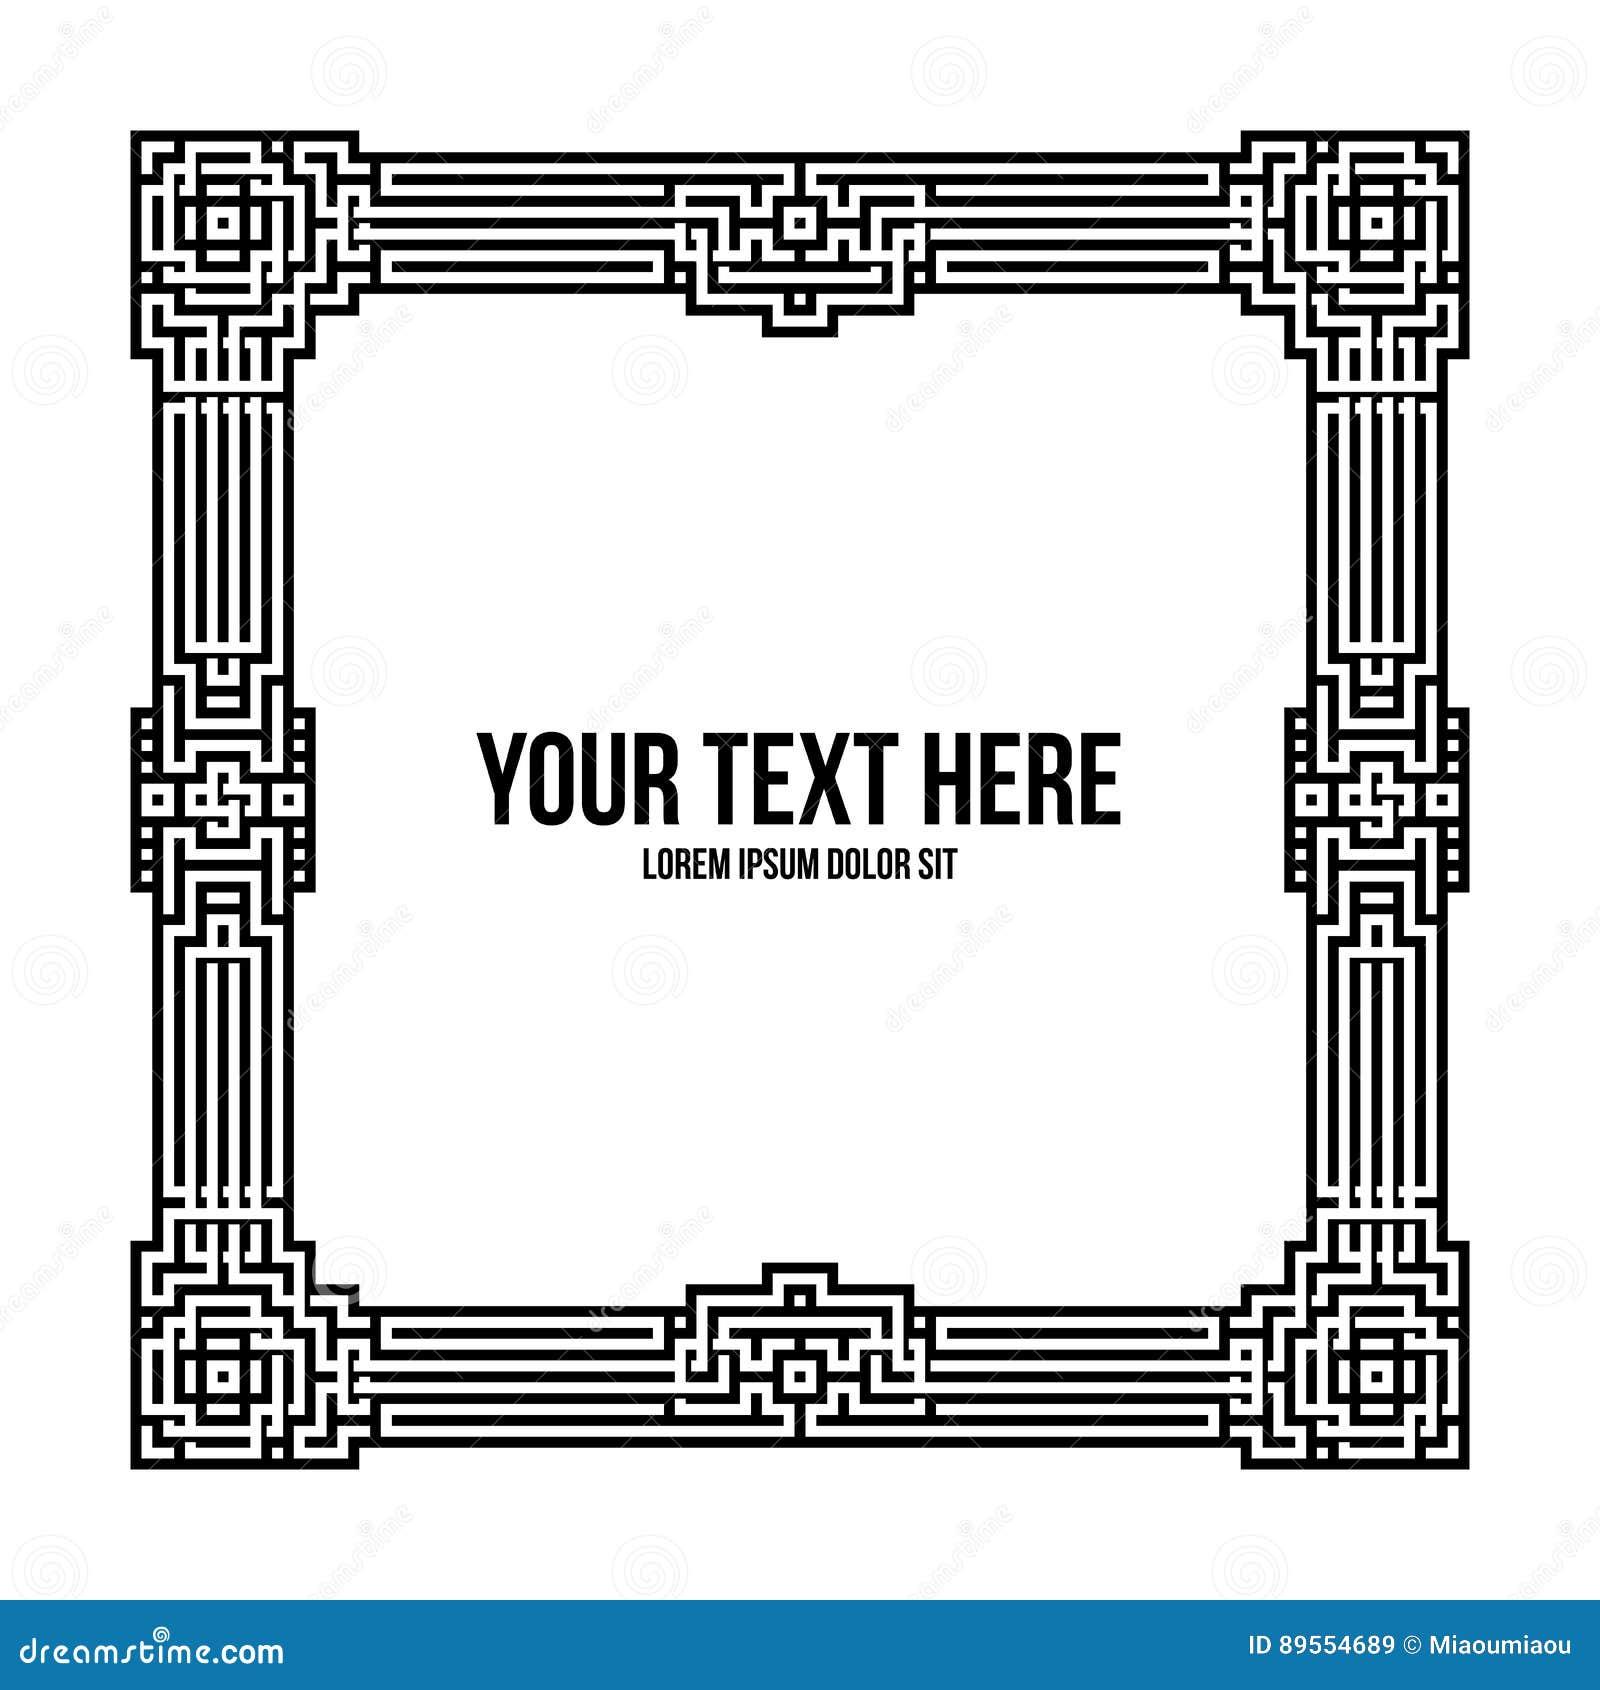 art deco square frame with native american elements stock vector illustration 89554689. Black Bedroom Furniture Sets. Home Design Ideas